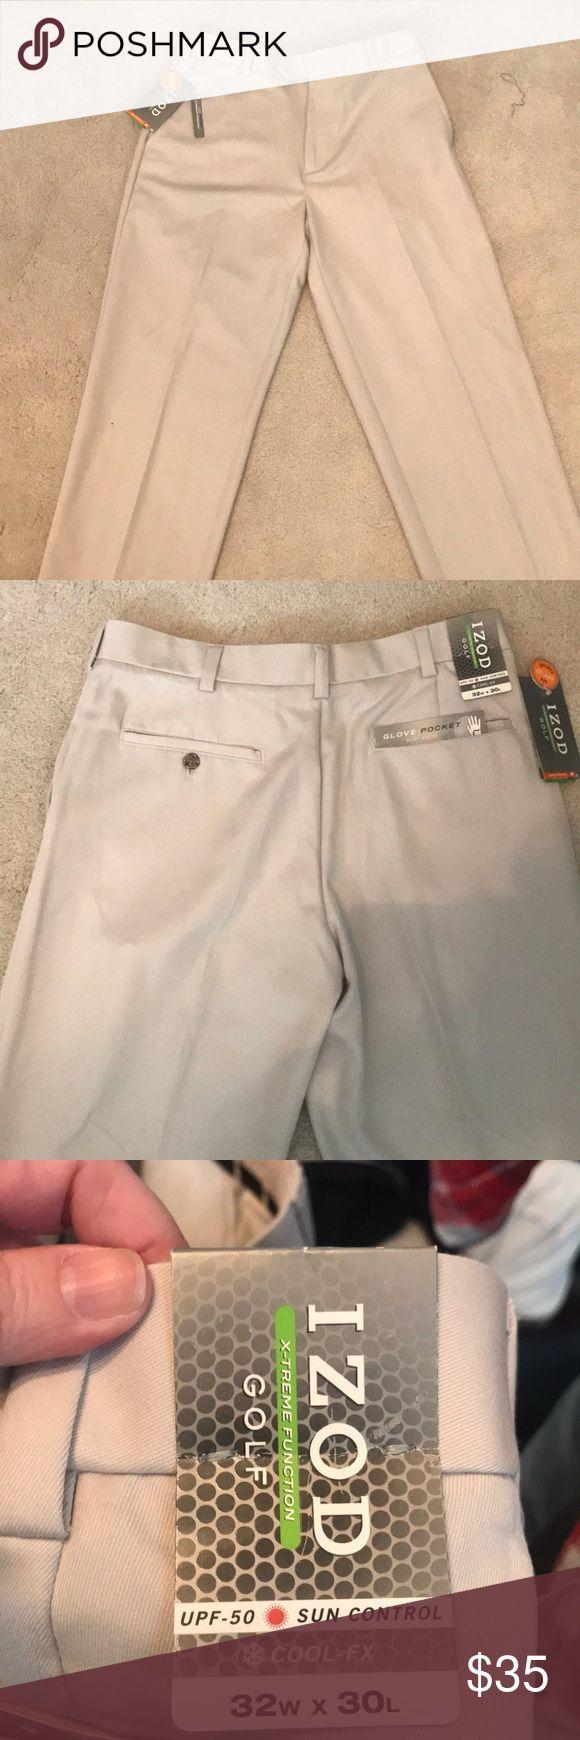 NWT Izod golf pants never worn NWT Izod golf pants never worn Izod Pants Chinos & Khakis